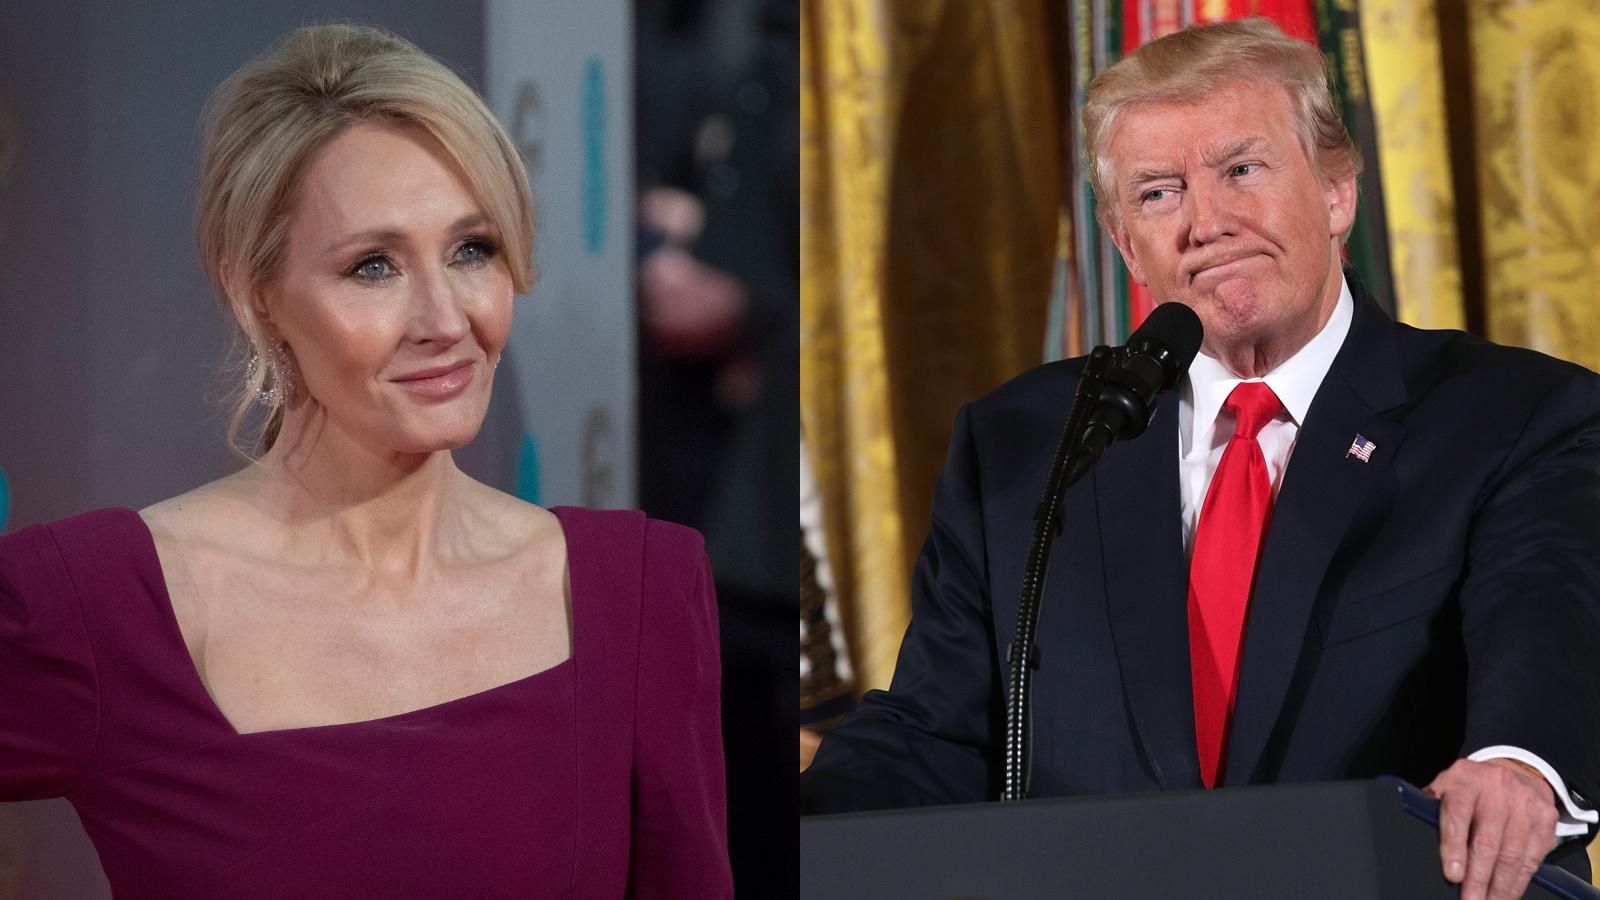 JK Rowling Donald Trump